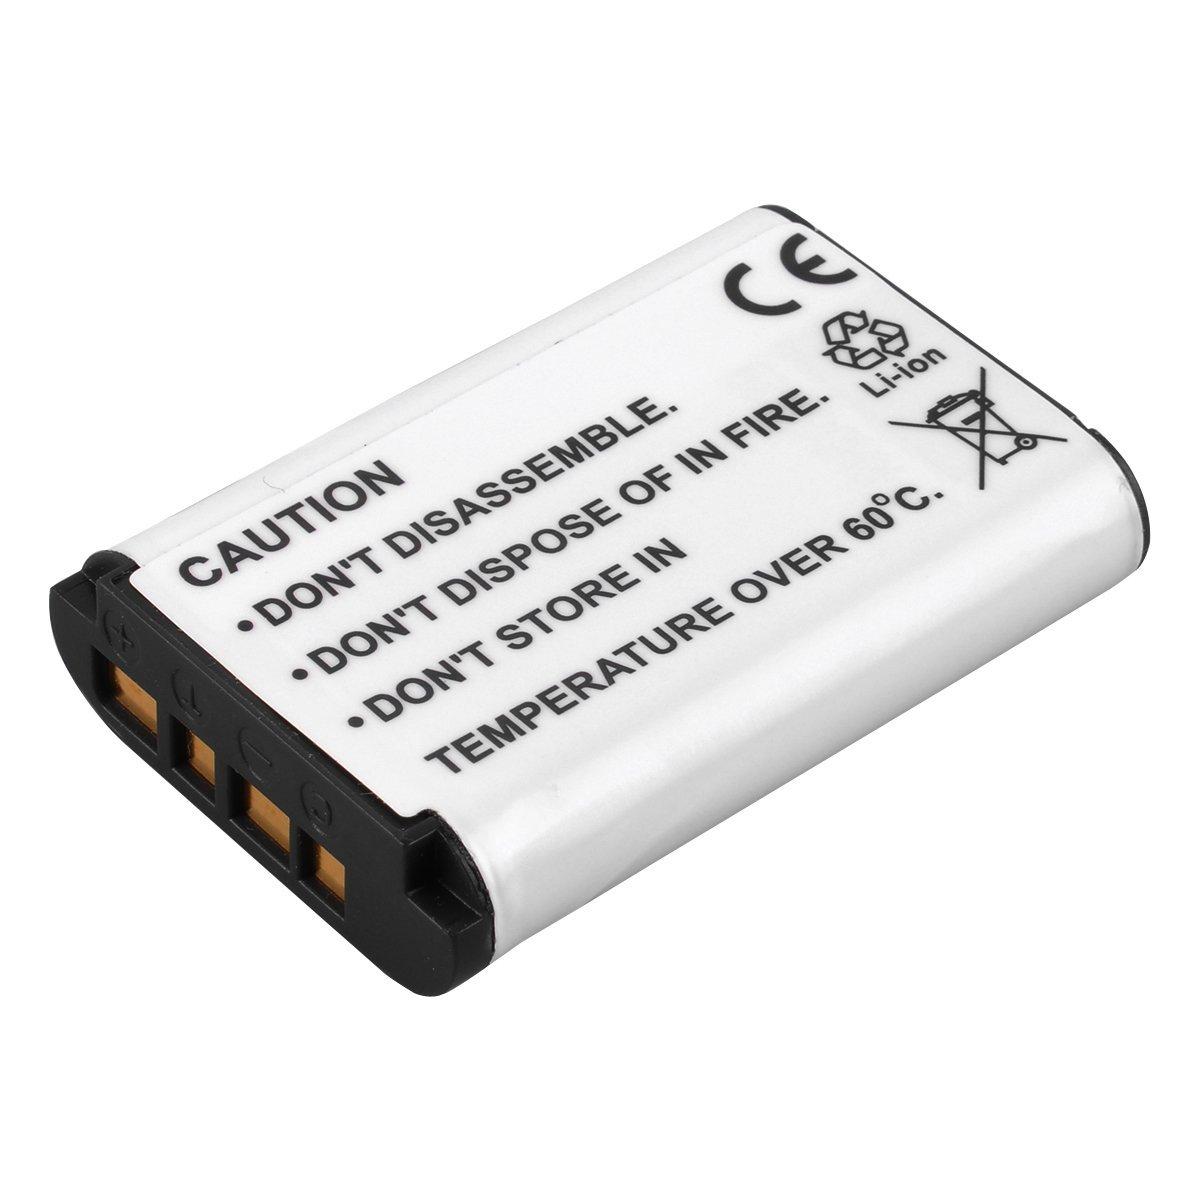 KIT BATERIA + CARREGADOR Sony NP-BX1 para Sony DSC-RX1, DSC-RX100M2, DSC-HX300, HDR-MV1, HDR-AS15, DSC-H400